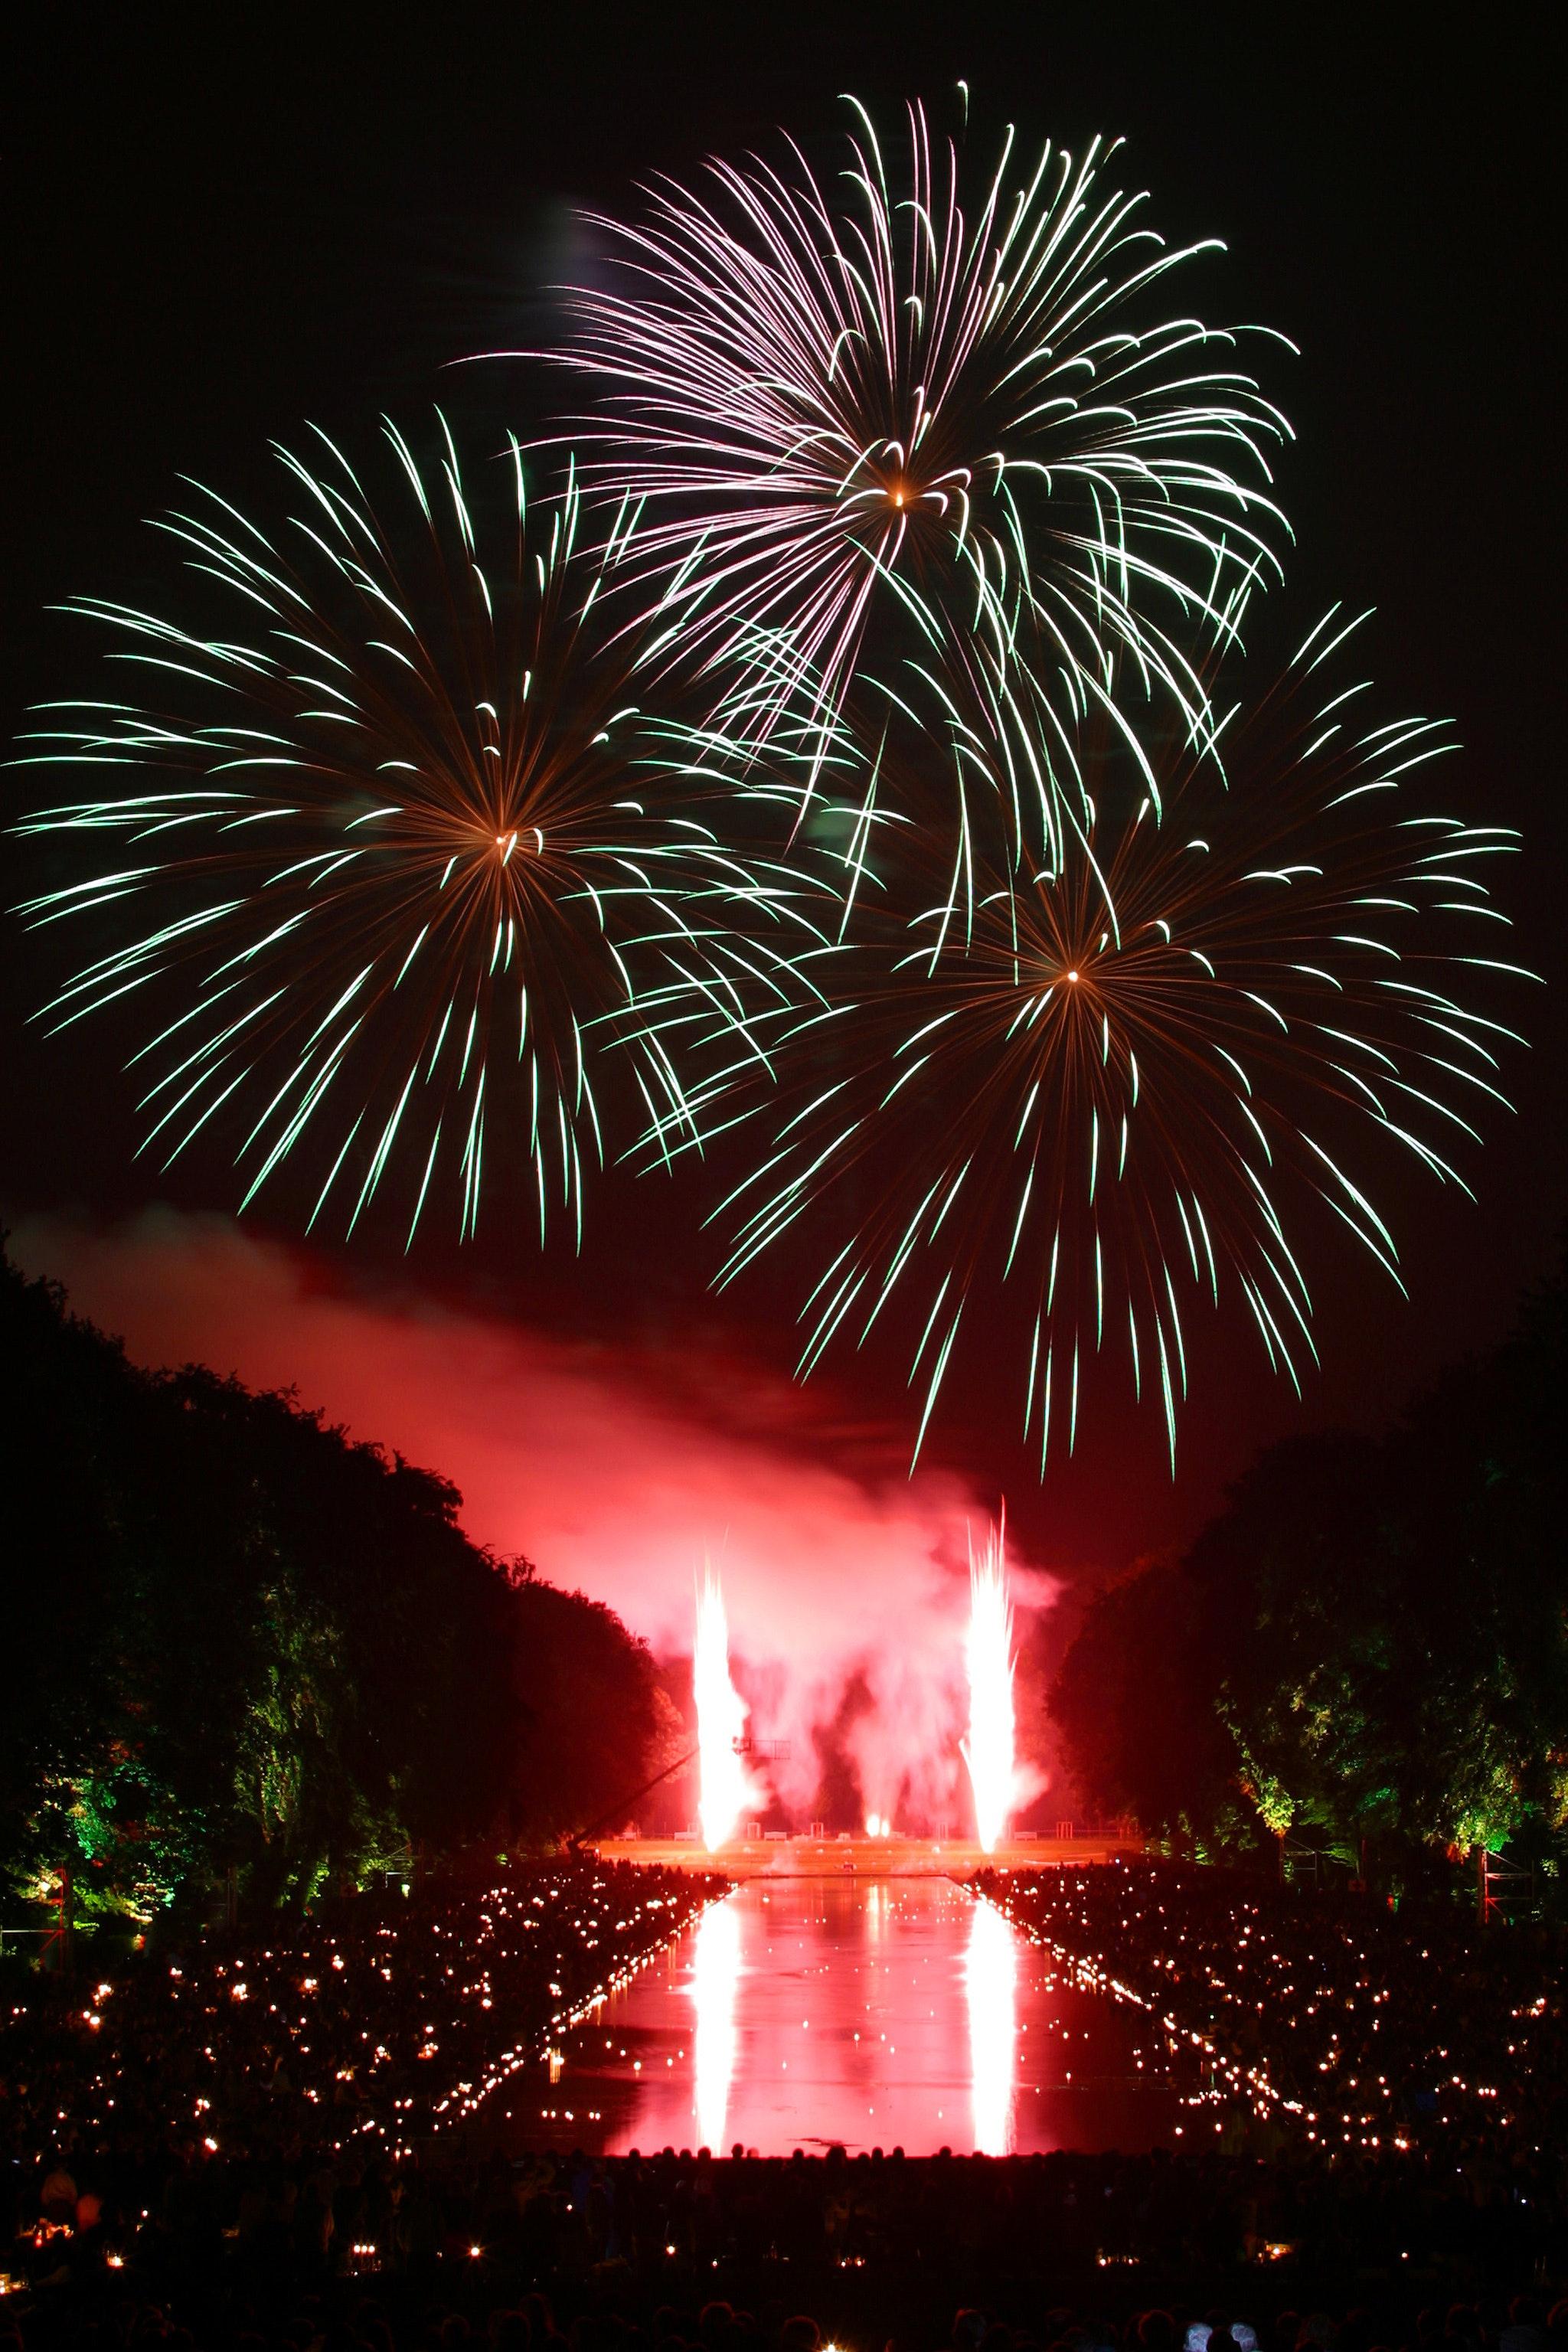 Fireworks Display, 2018, Fireworks, Trees, Sparks, HQ Photo